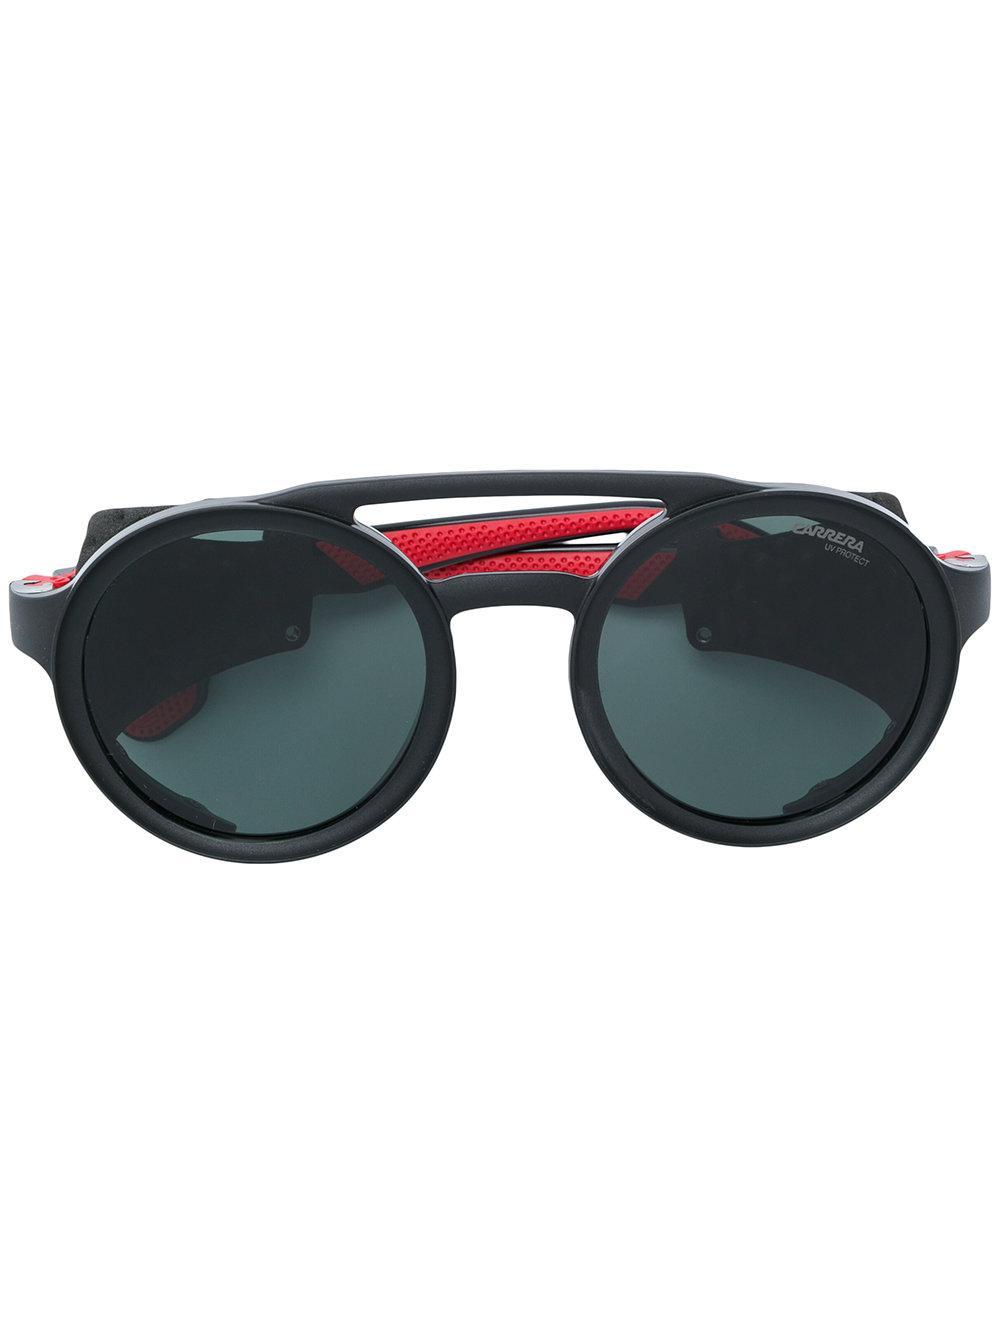 c0d0eecb1 Carrera Hyperfit Round Sunglasses - Red   ModeSens